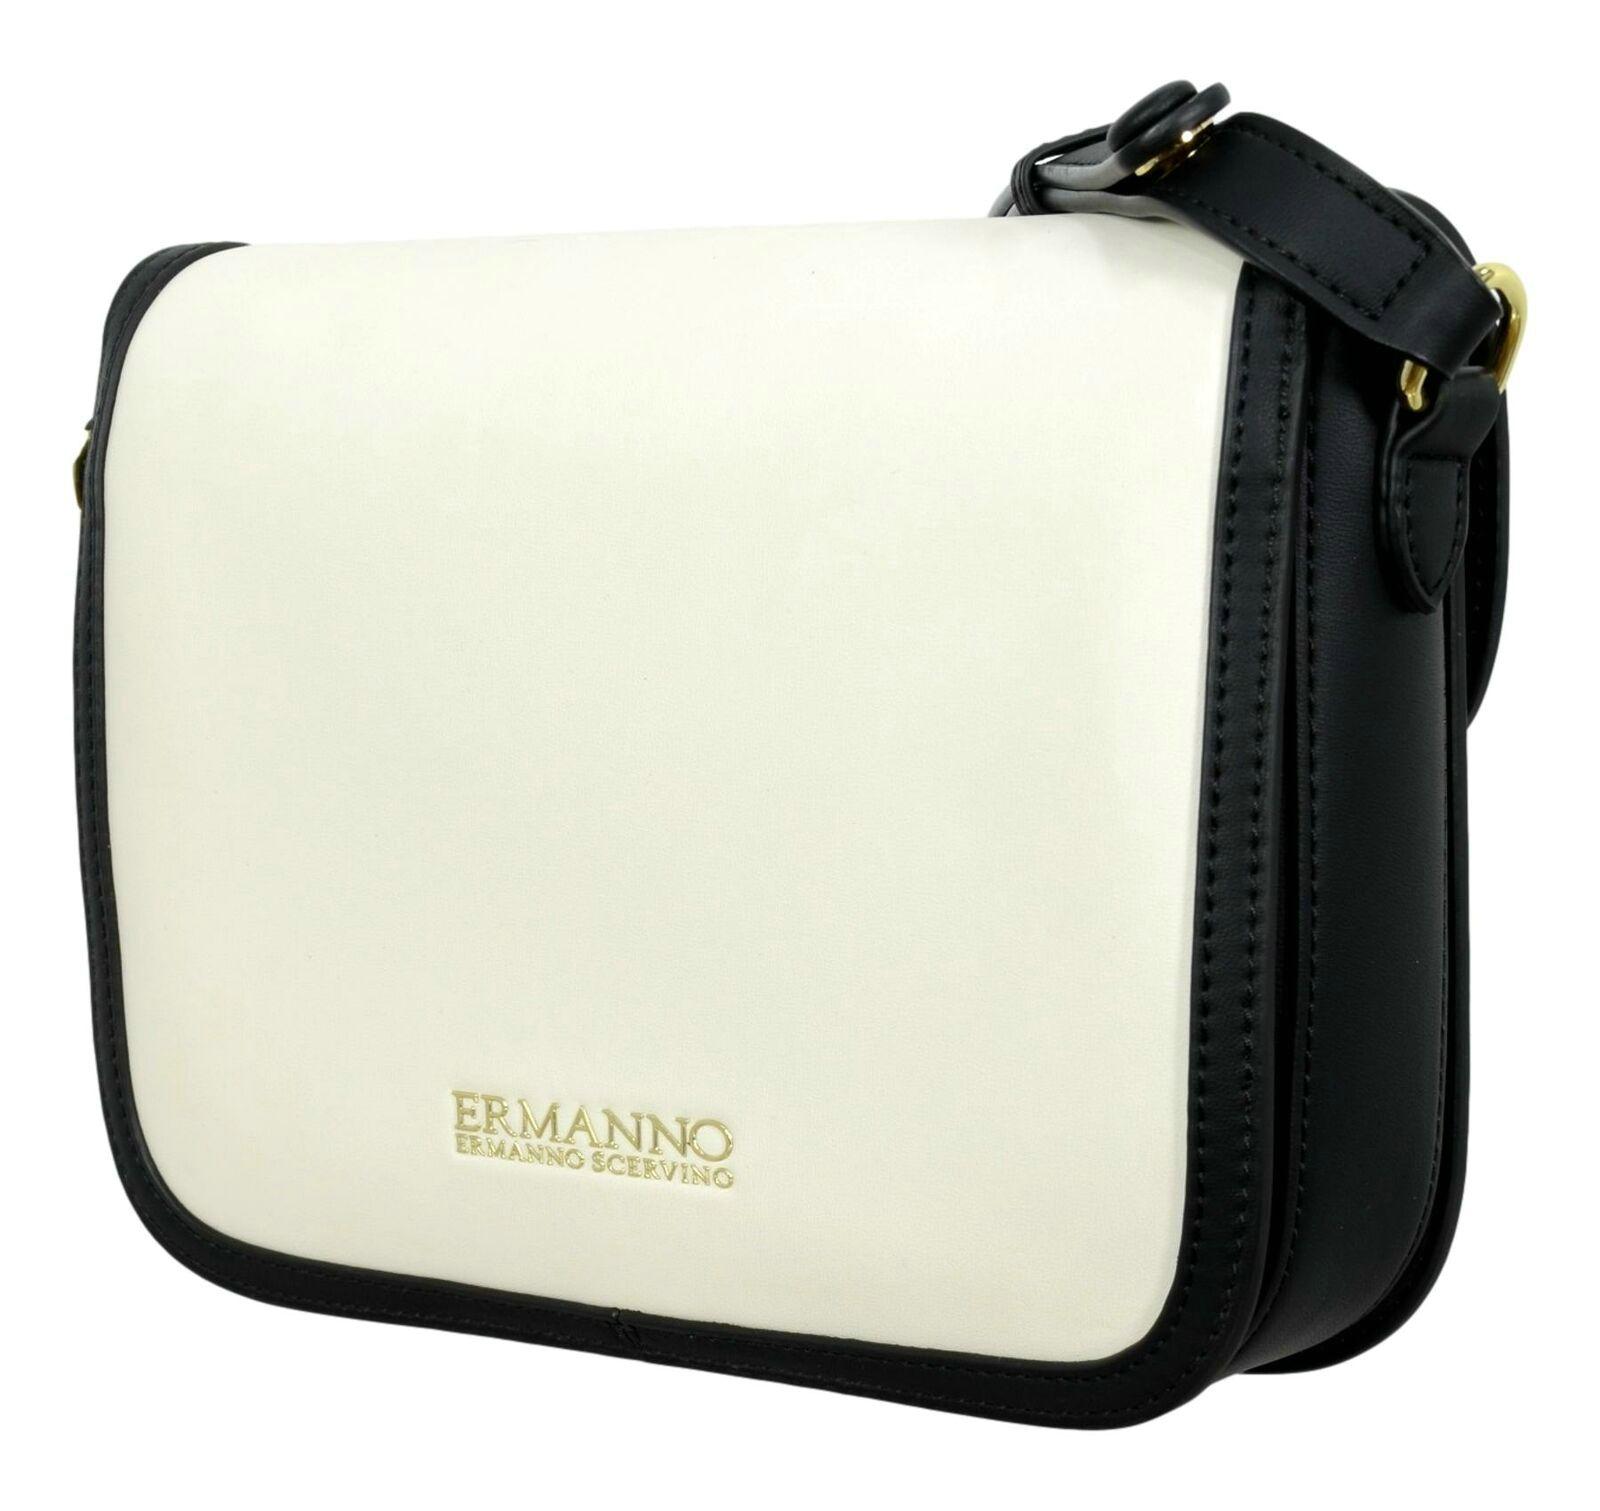 Borsa Ermanno Scervino Medium Flap Bag Joey 12401155 whiteblack retro